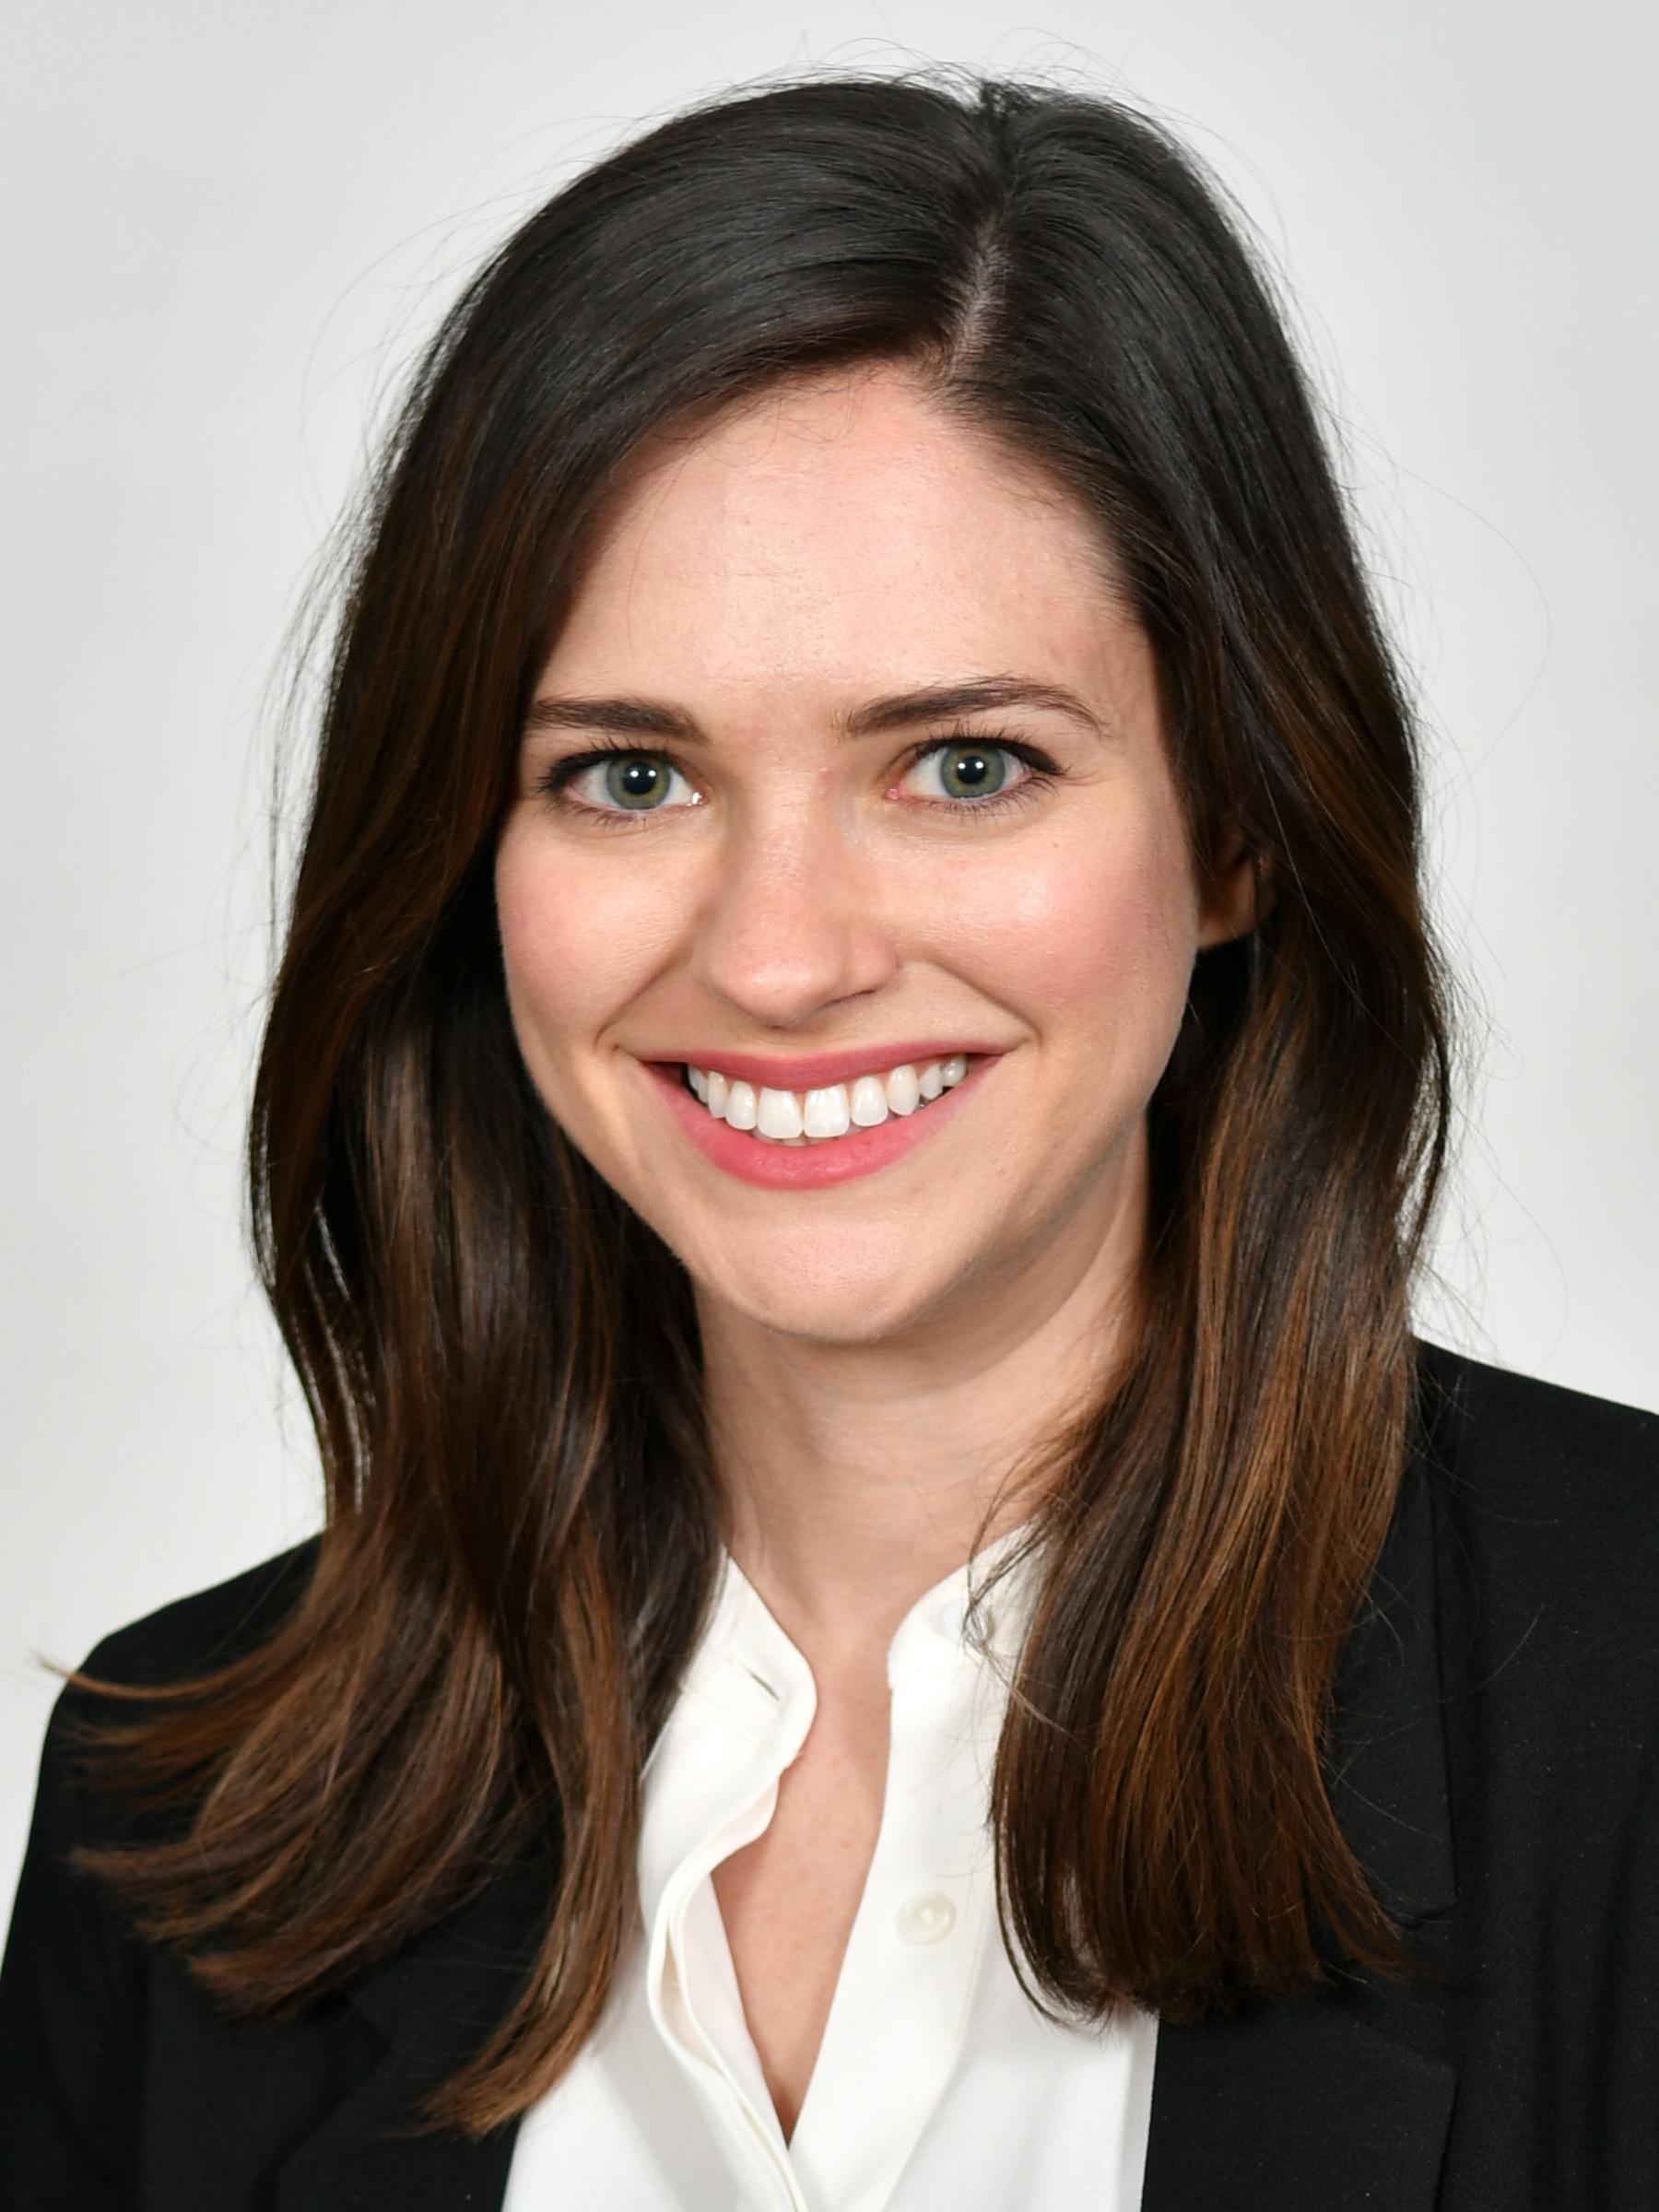 Olivia Reeves, VP of Communication